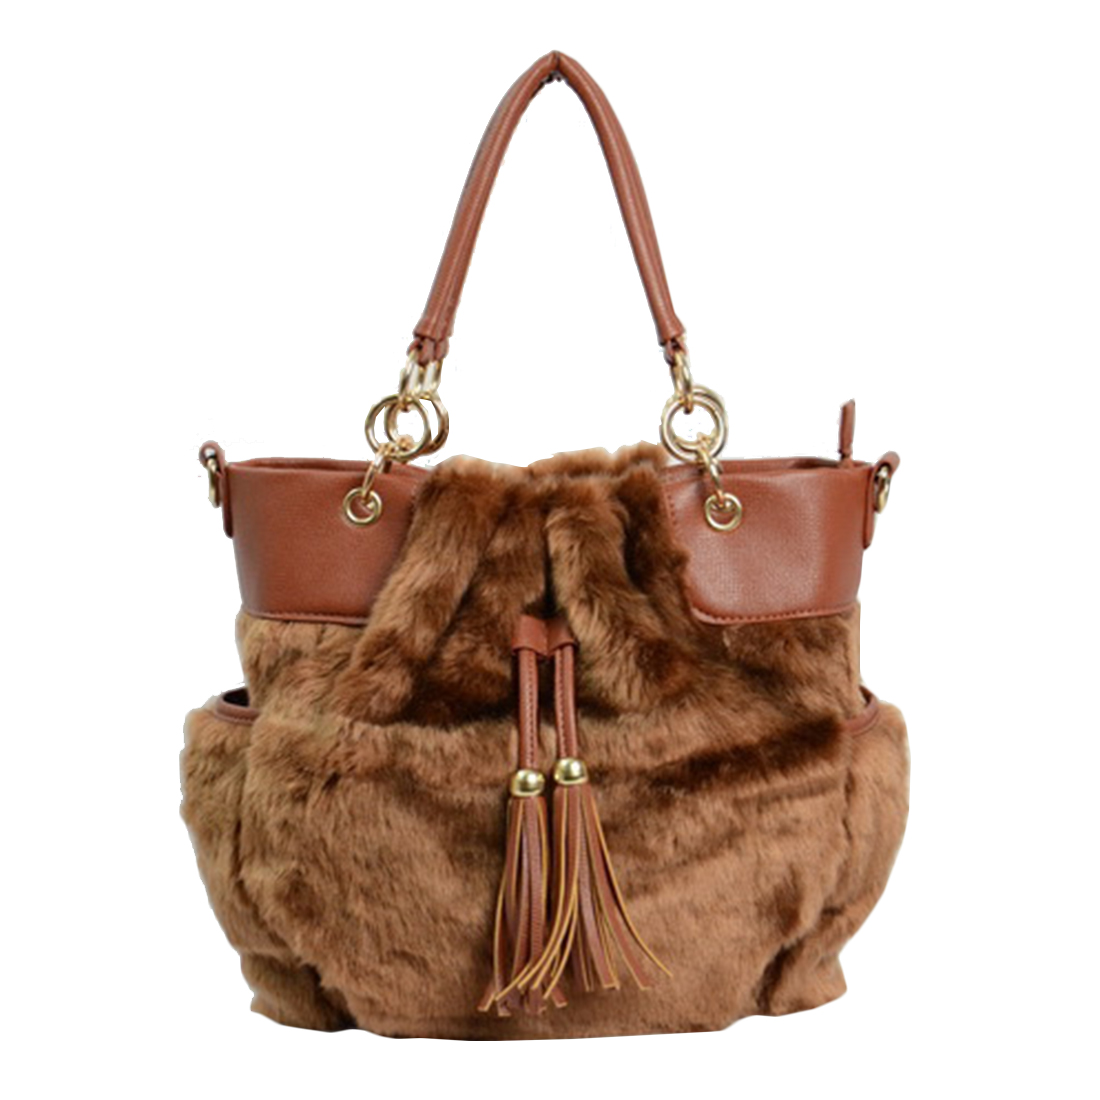 2017 Winter  Luxury Handbags For Women Famous Brand Female Faux Fur Shoulder Bags  tassel patchwork CrossBody Bag Bolsa Feminina